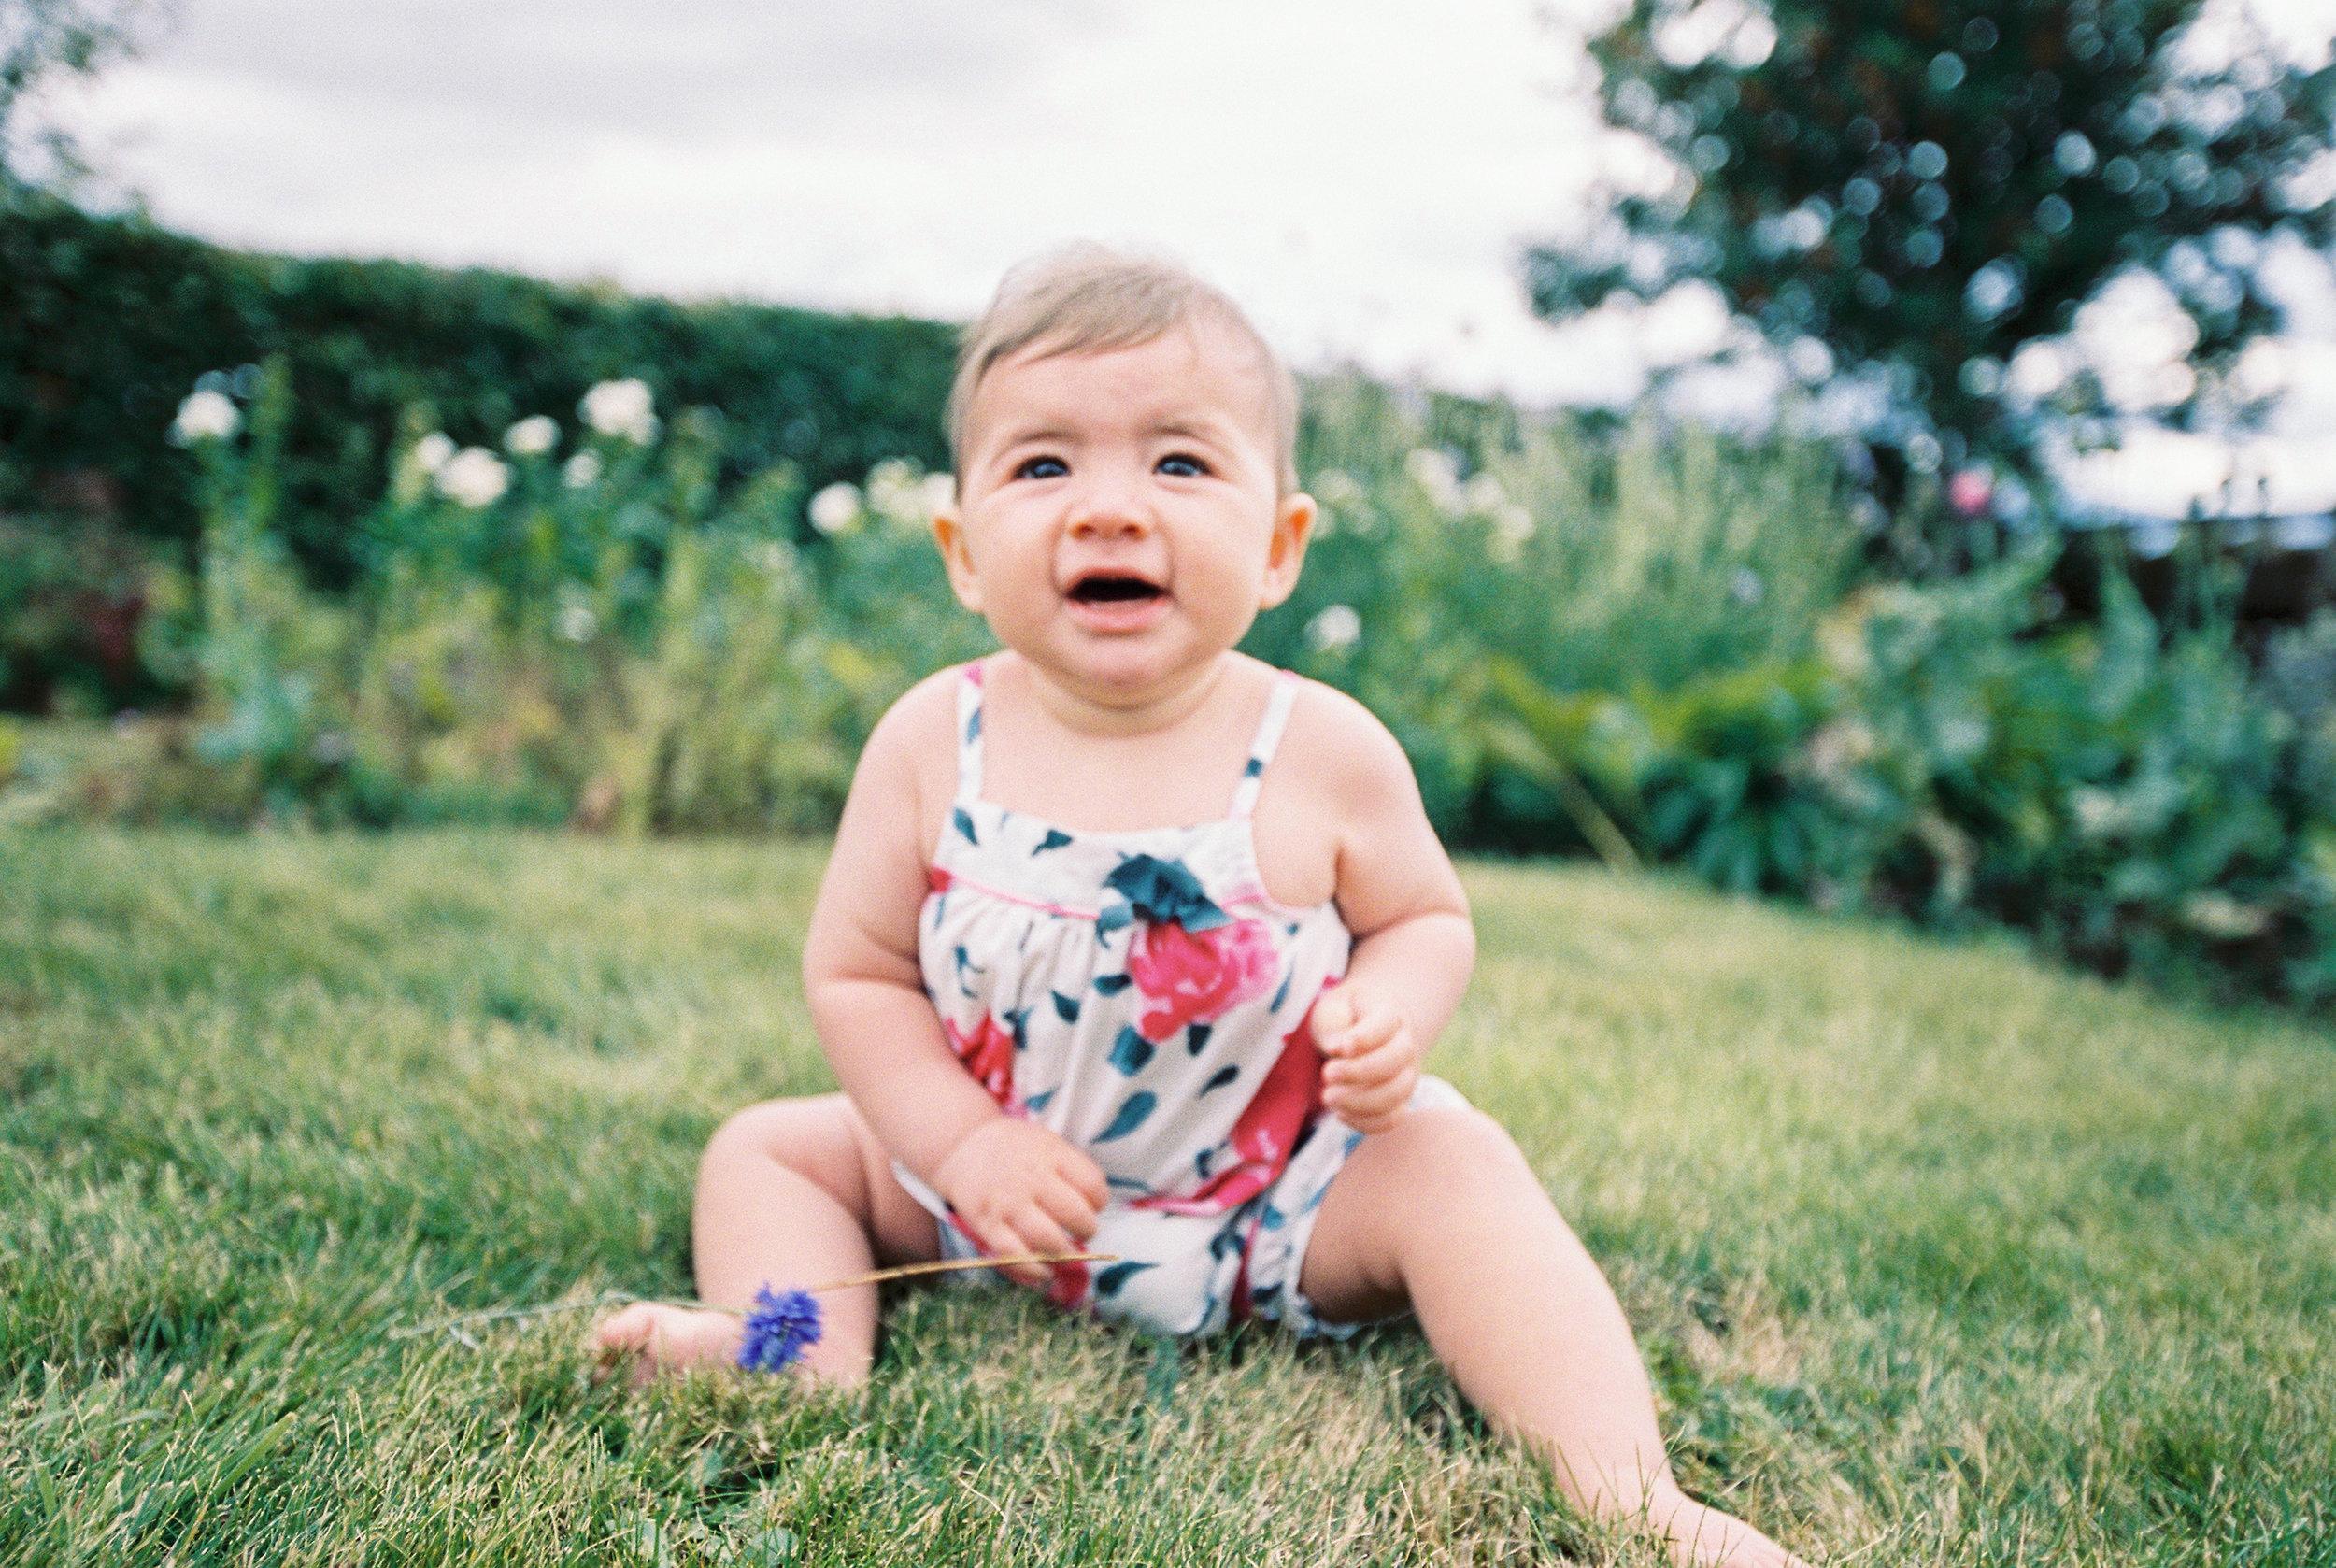 cumbria_family_photographer (271).jpg